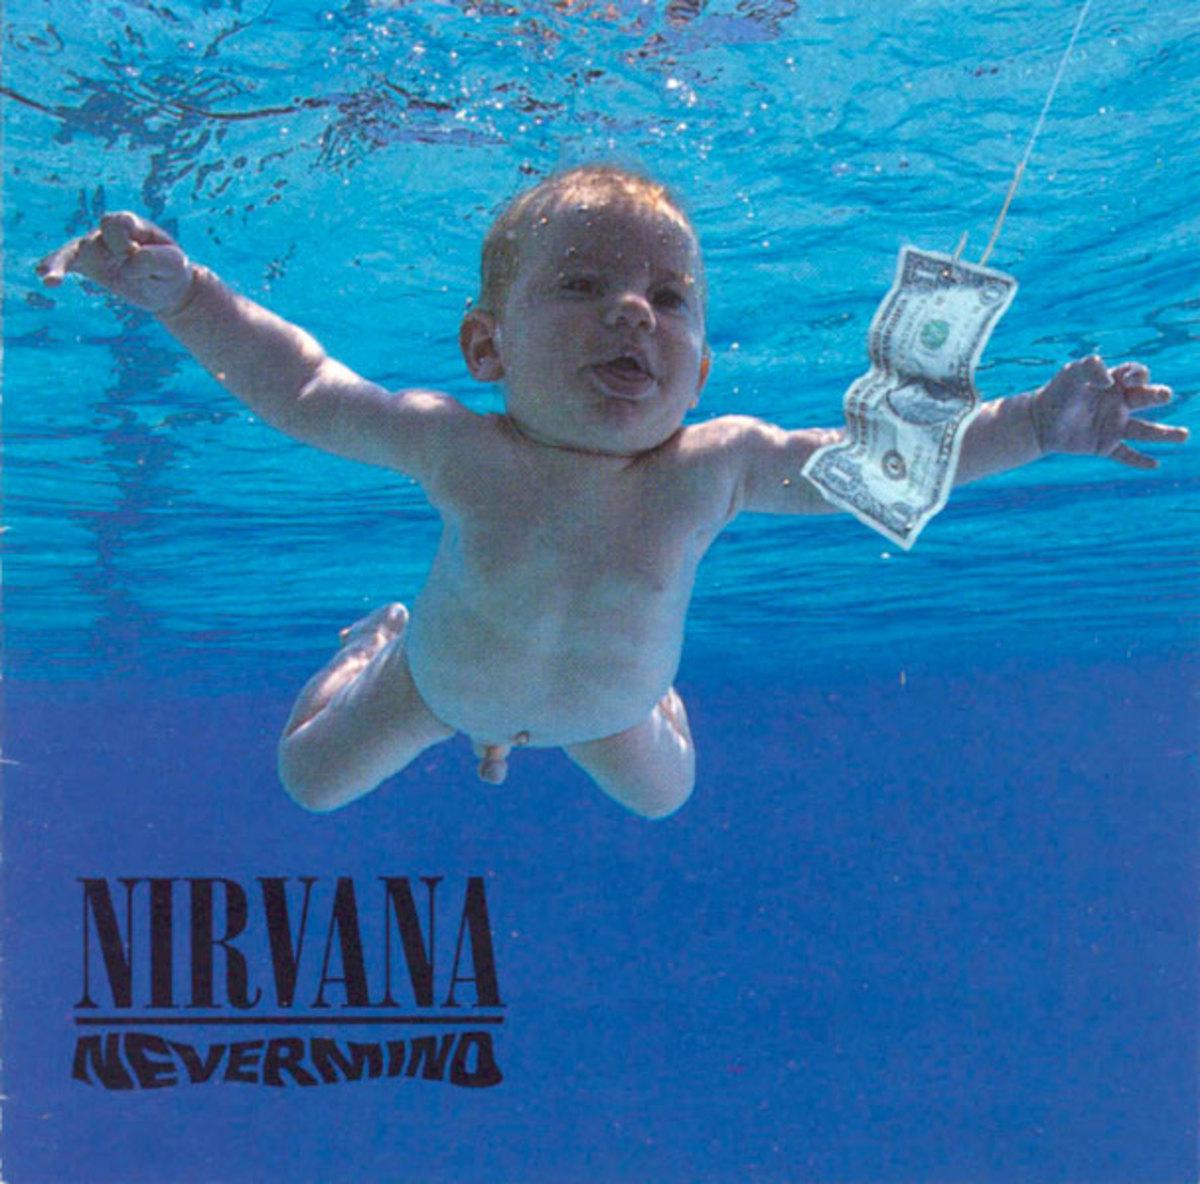 """Nevermind"" by Nirvana"